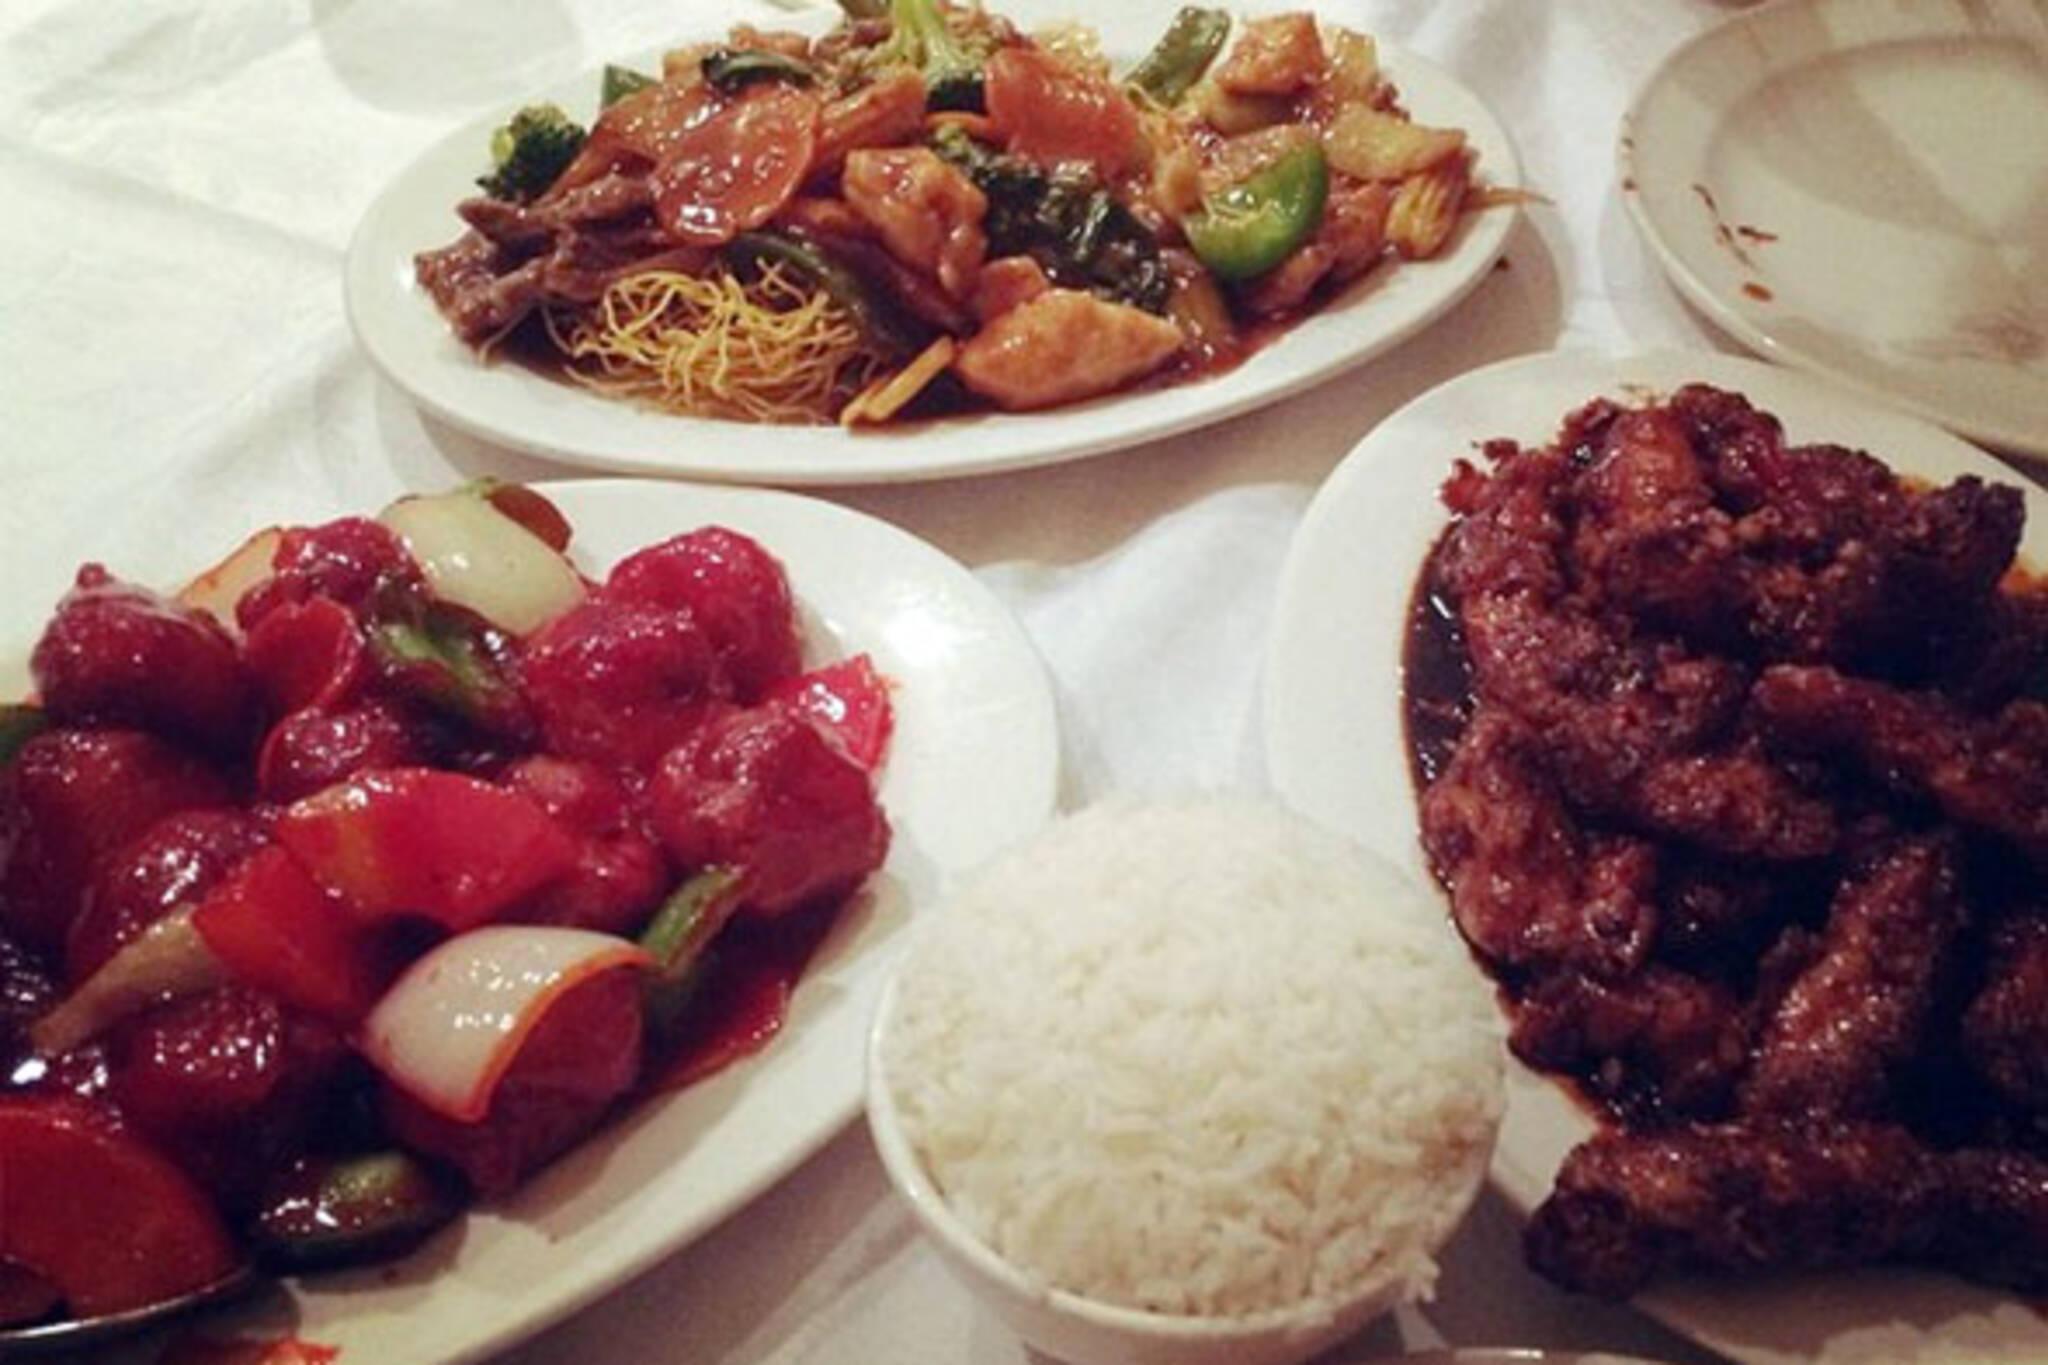 szechuan gourmet toronto